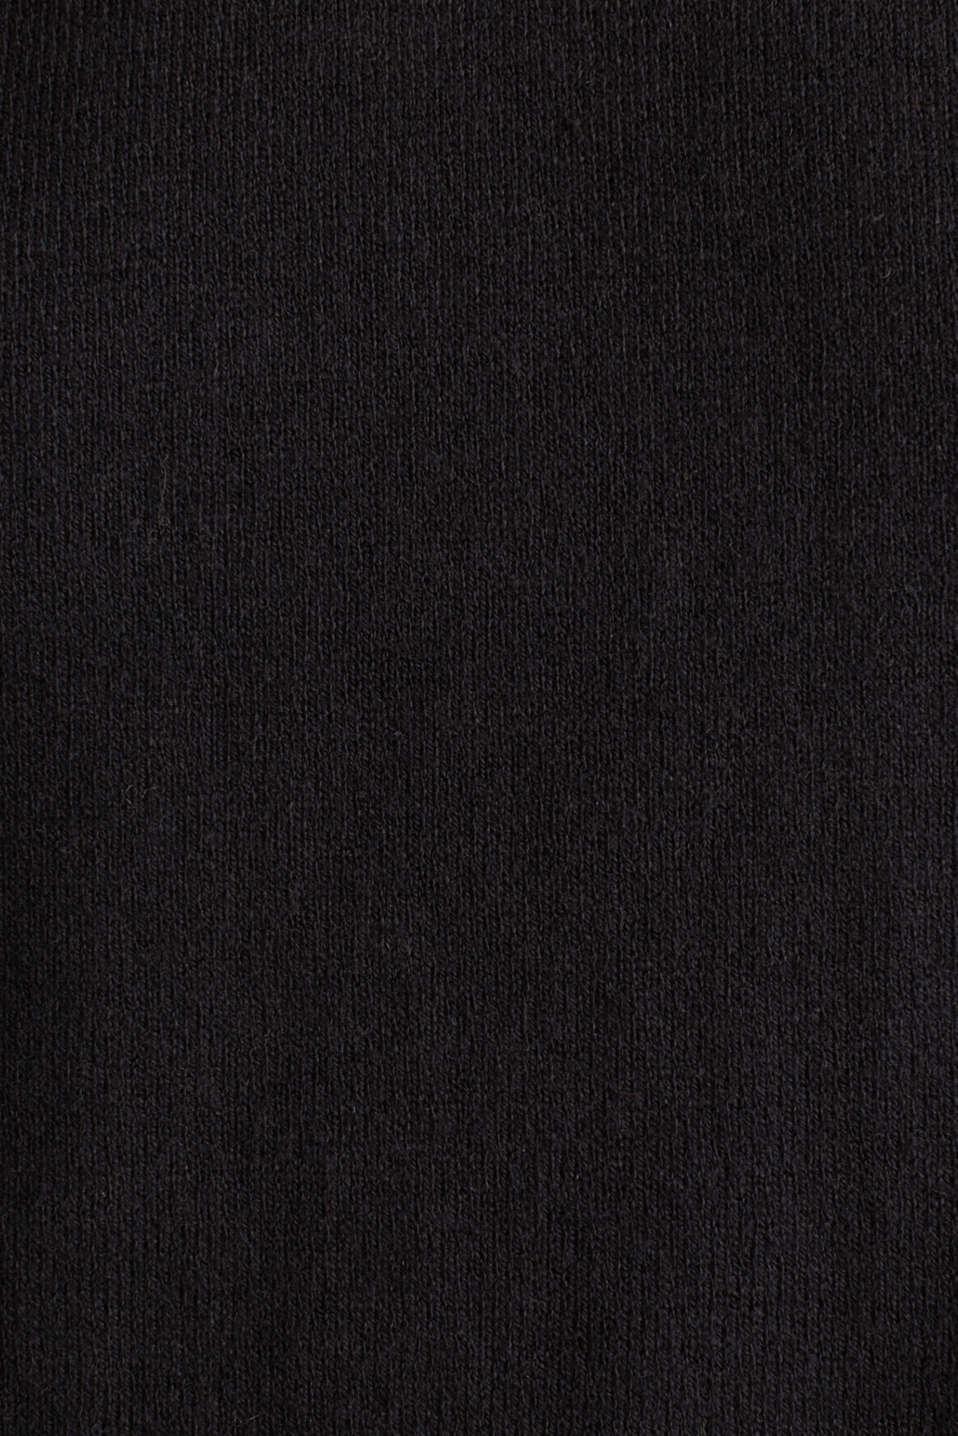 With linen: Jumper with open-work patterned details, BLACK, detail image number 3